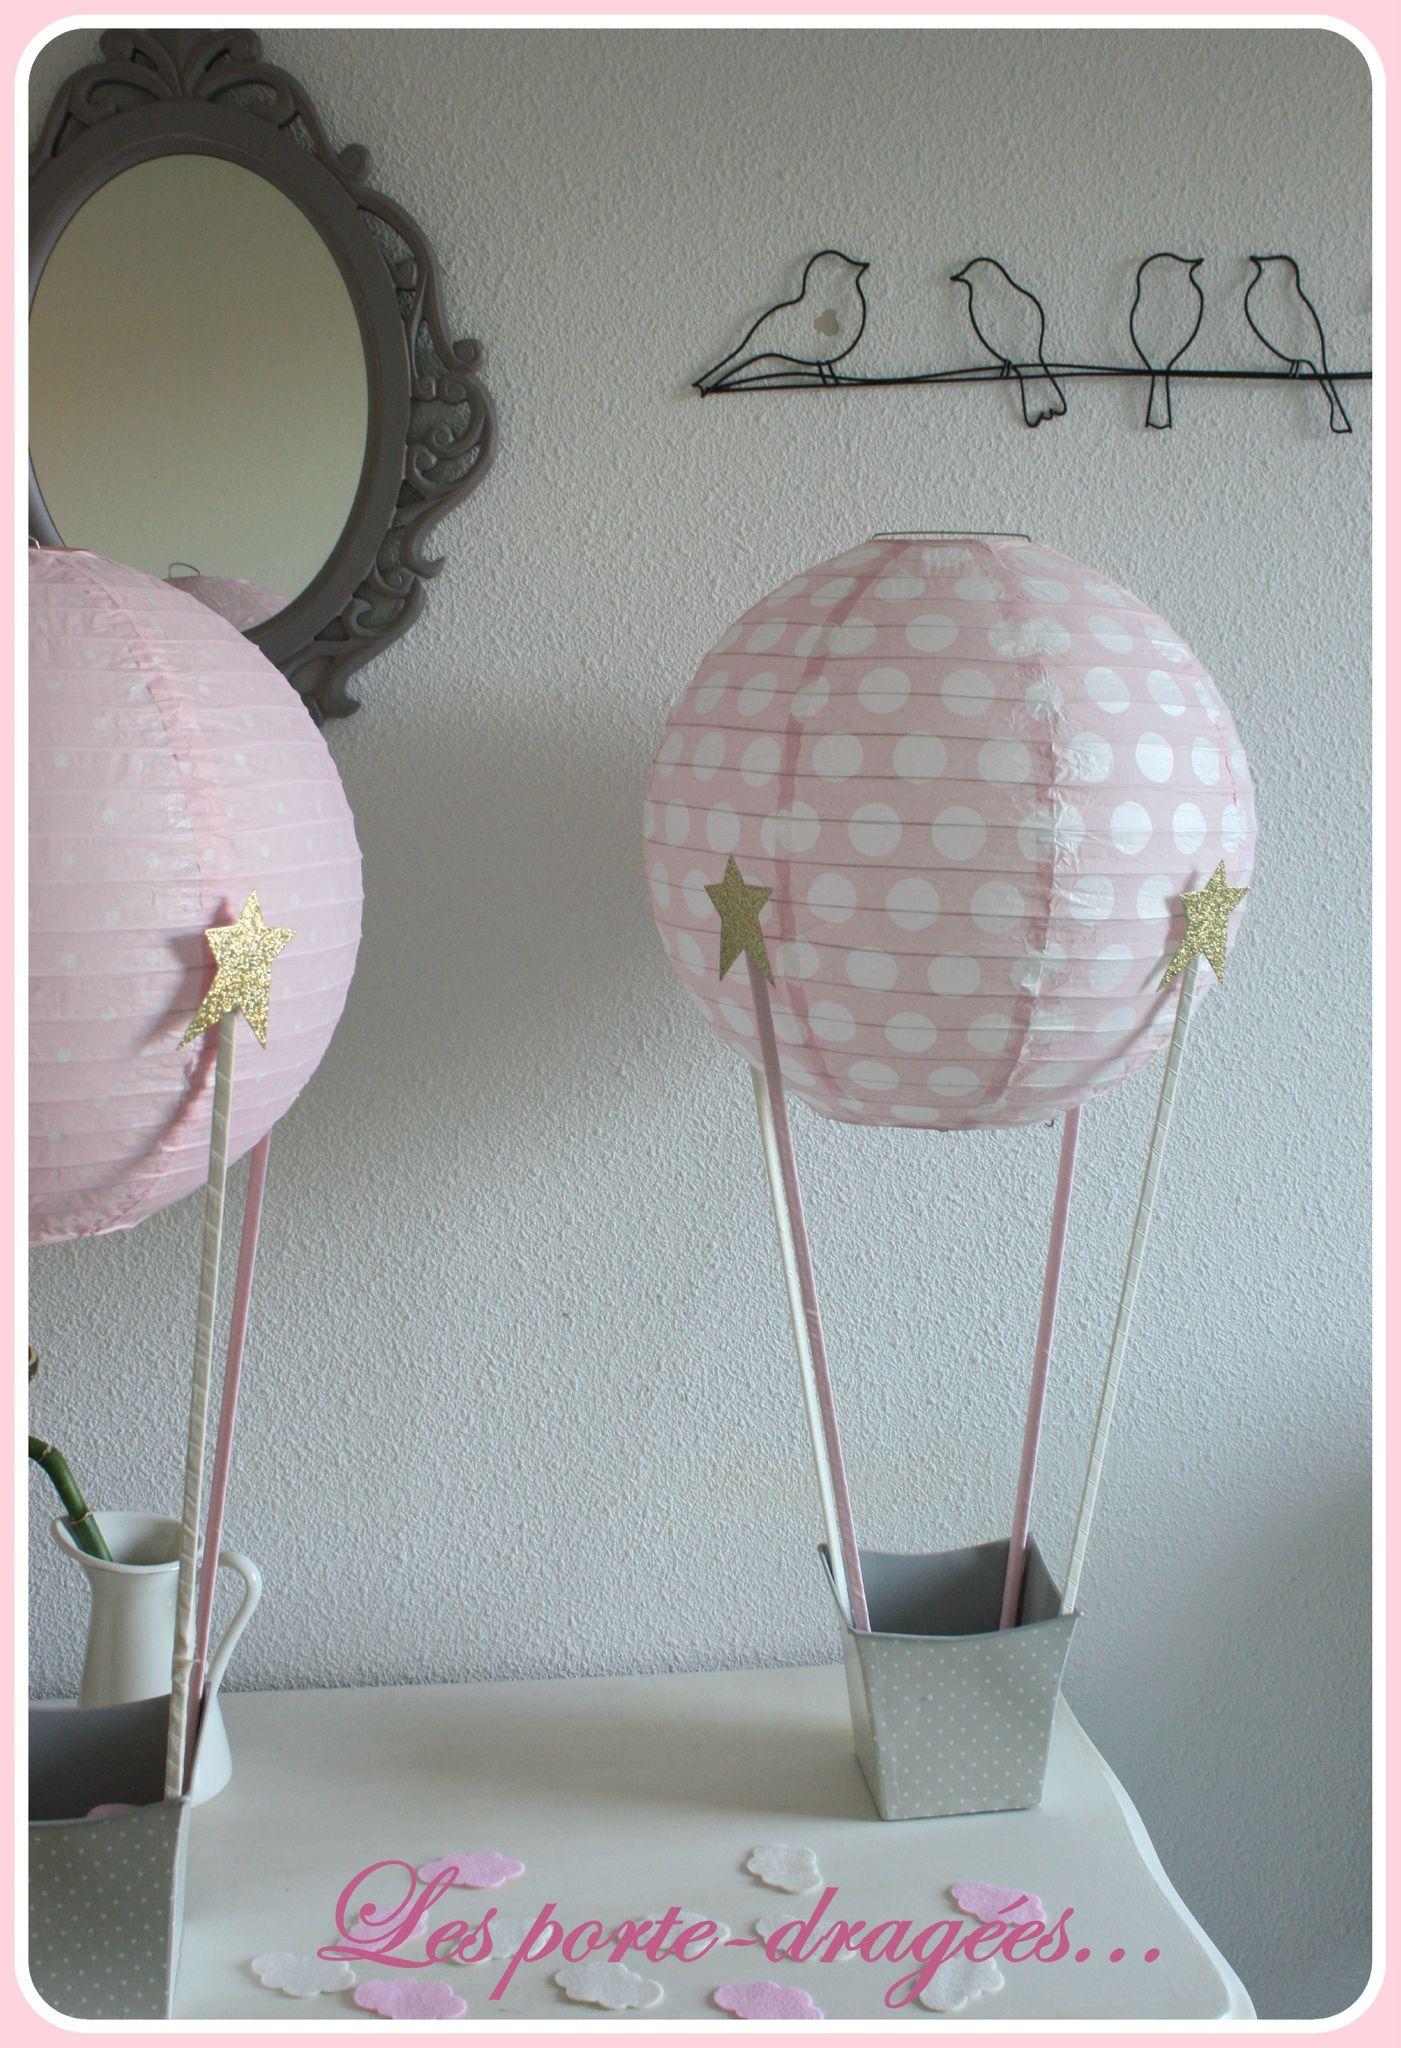 deco bapteme fille rose montgolfiere dore dragees bapteme elena pinterest deco bapteme. Black Bedroom Furniture Sets. Home Design Ideas